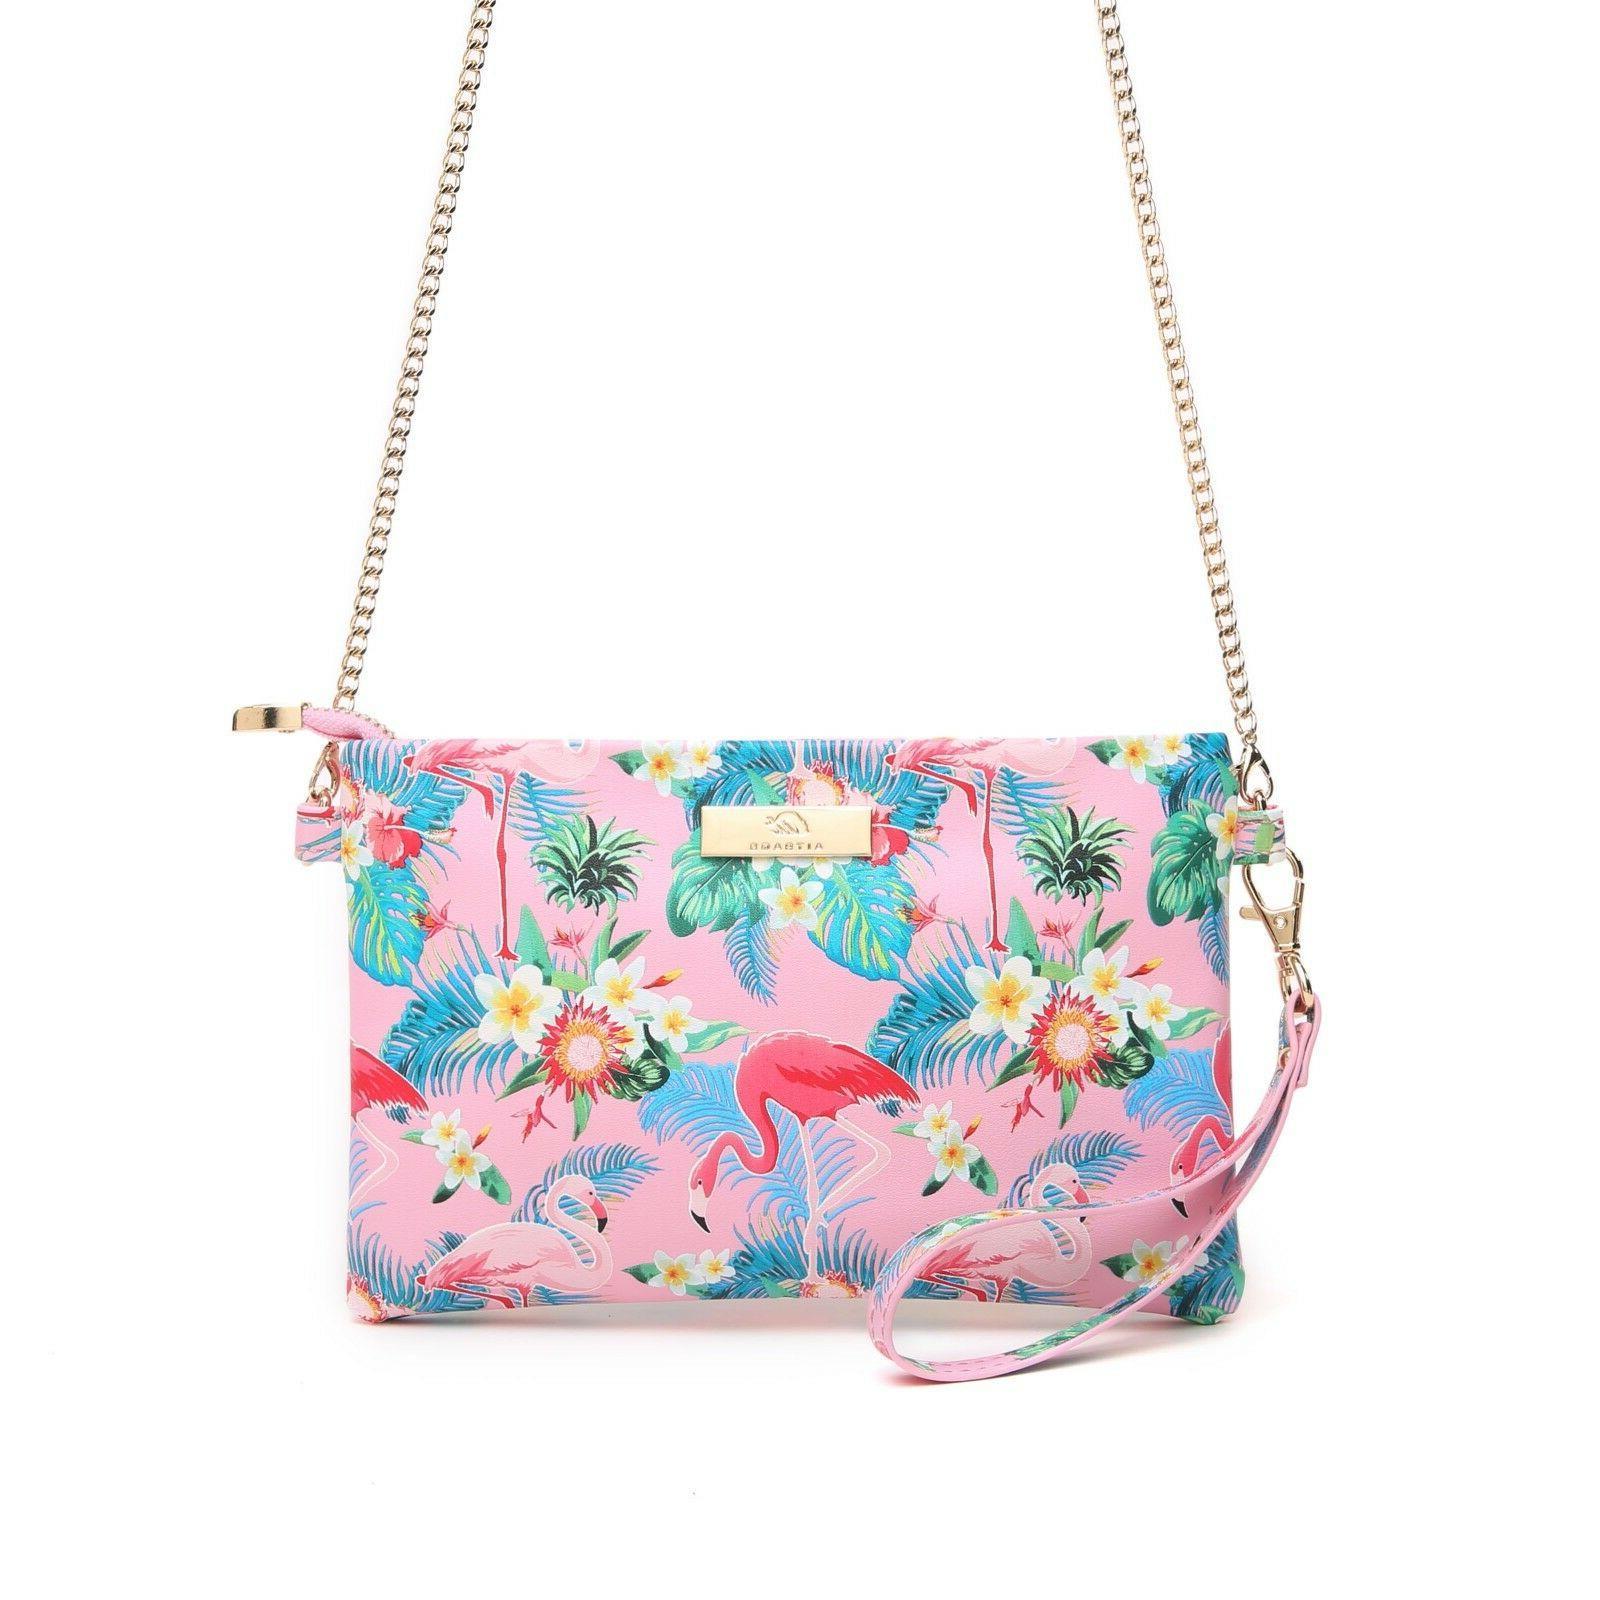 Aitbags Crossbody Bag for Women Wristlet